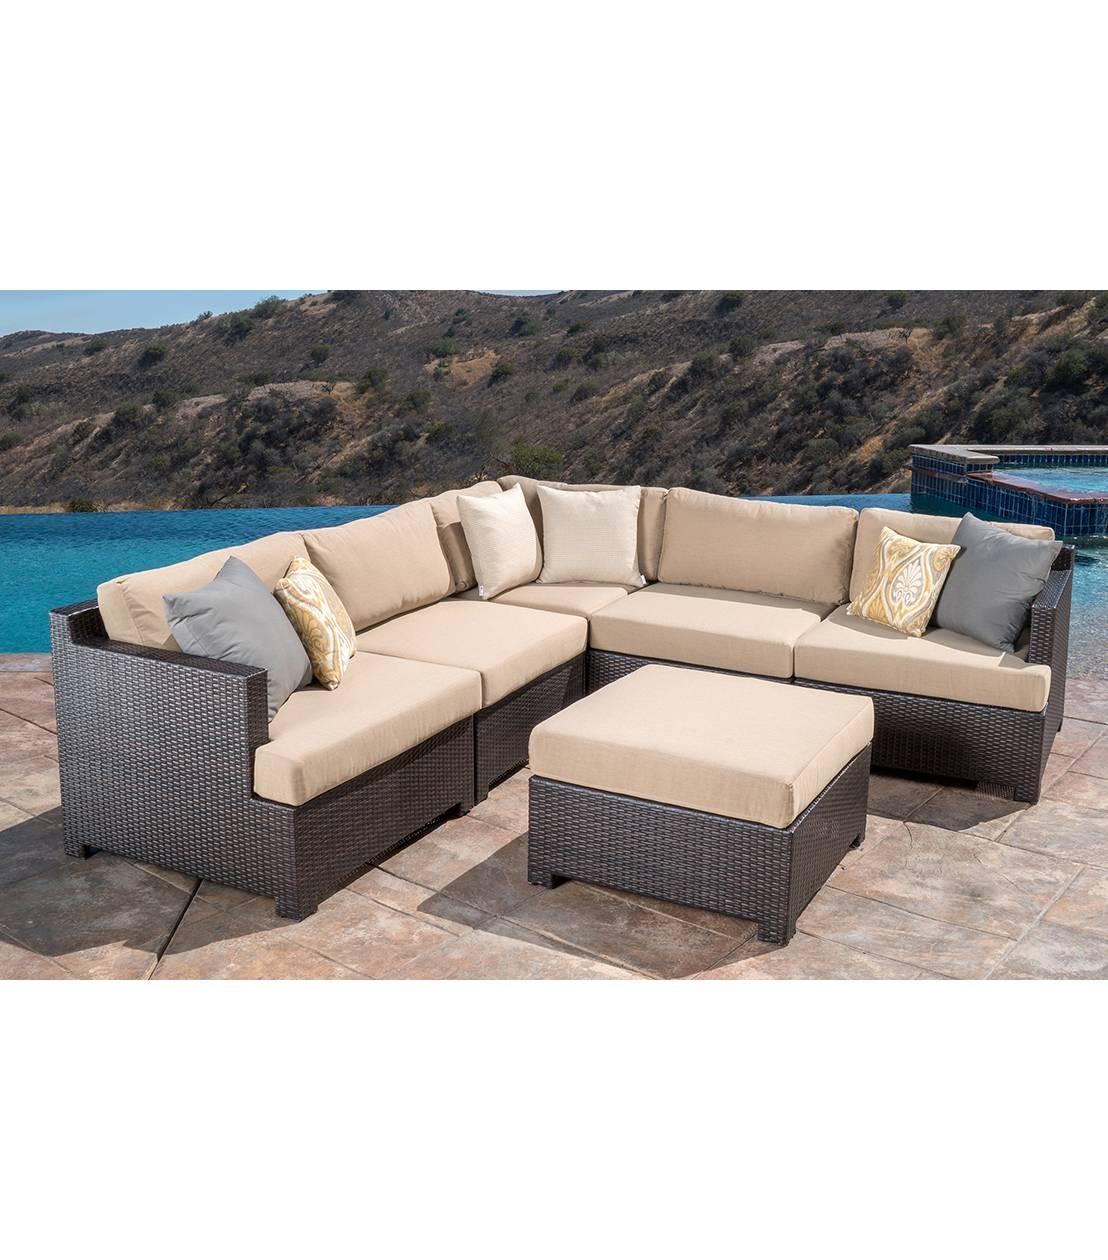 Patio Furniture : Belmont 6-Piece Modular Sectional Set in 6 Piece Modular Sectional Sofa (Image 20 of 30)